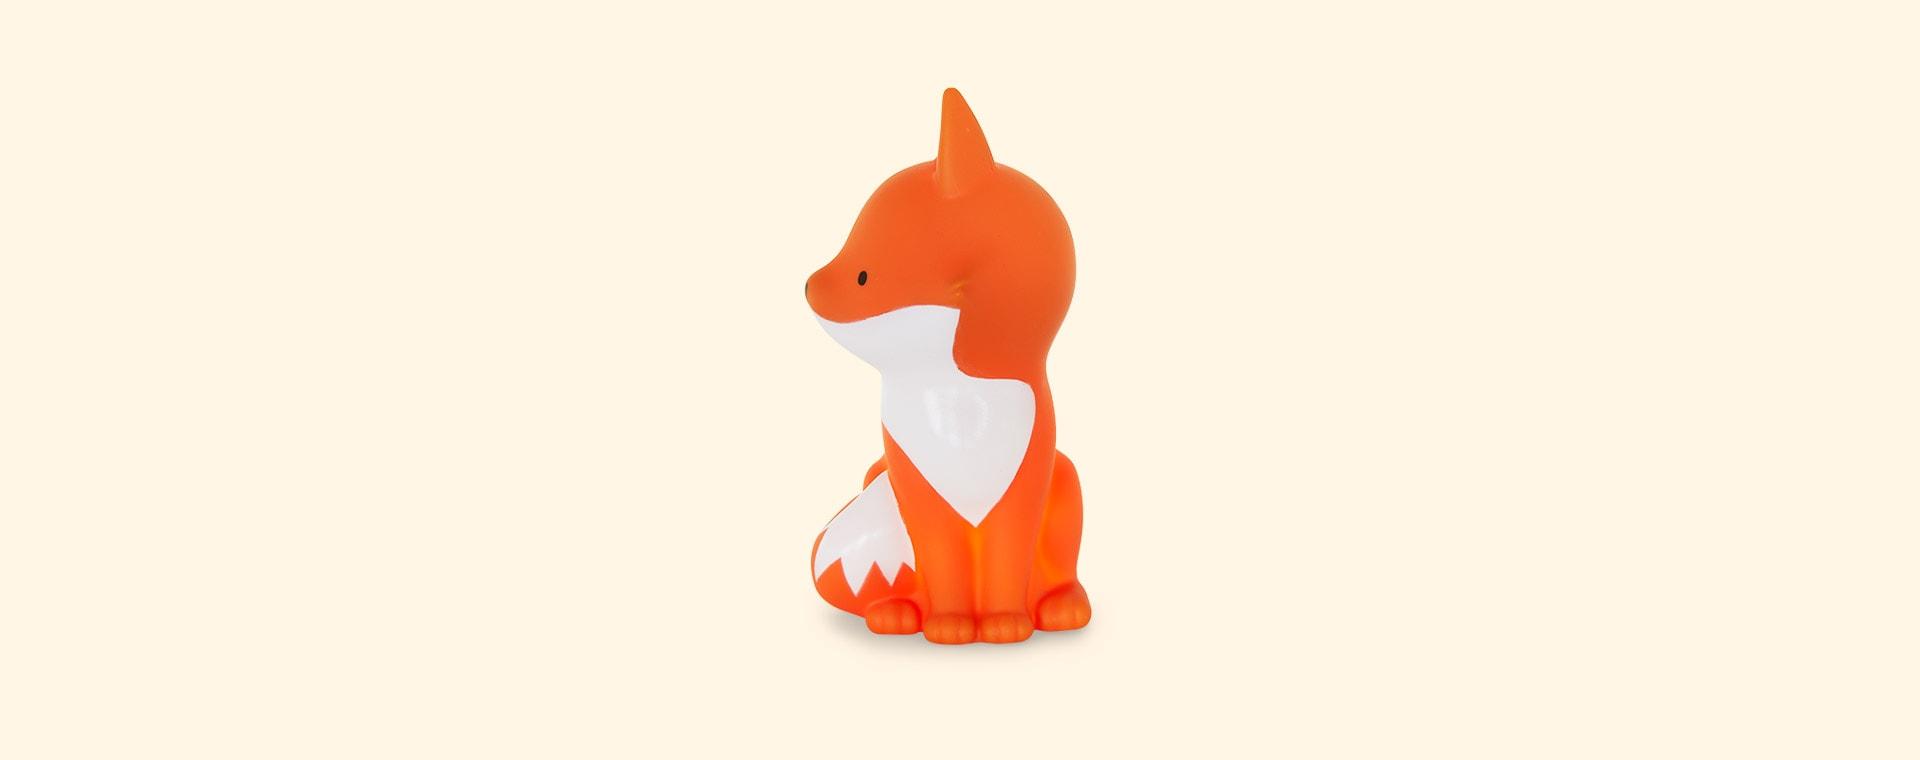 Orange A Little Lovely Company Fox Little Light